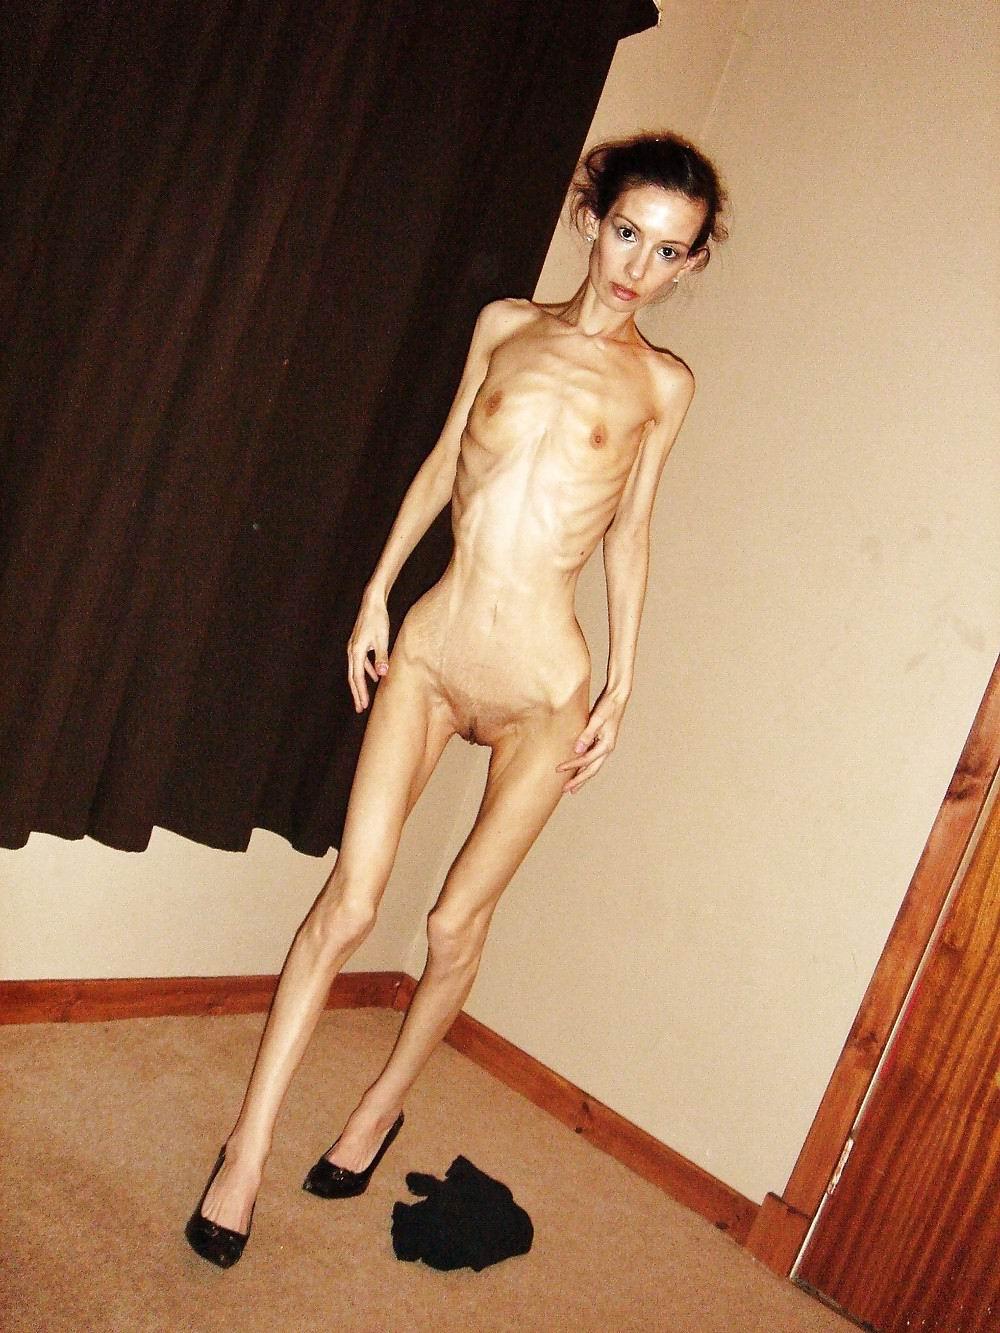 Anorexic Milf Xxgasm